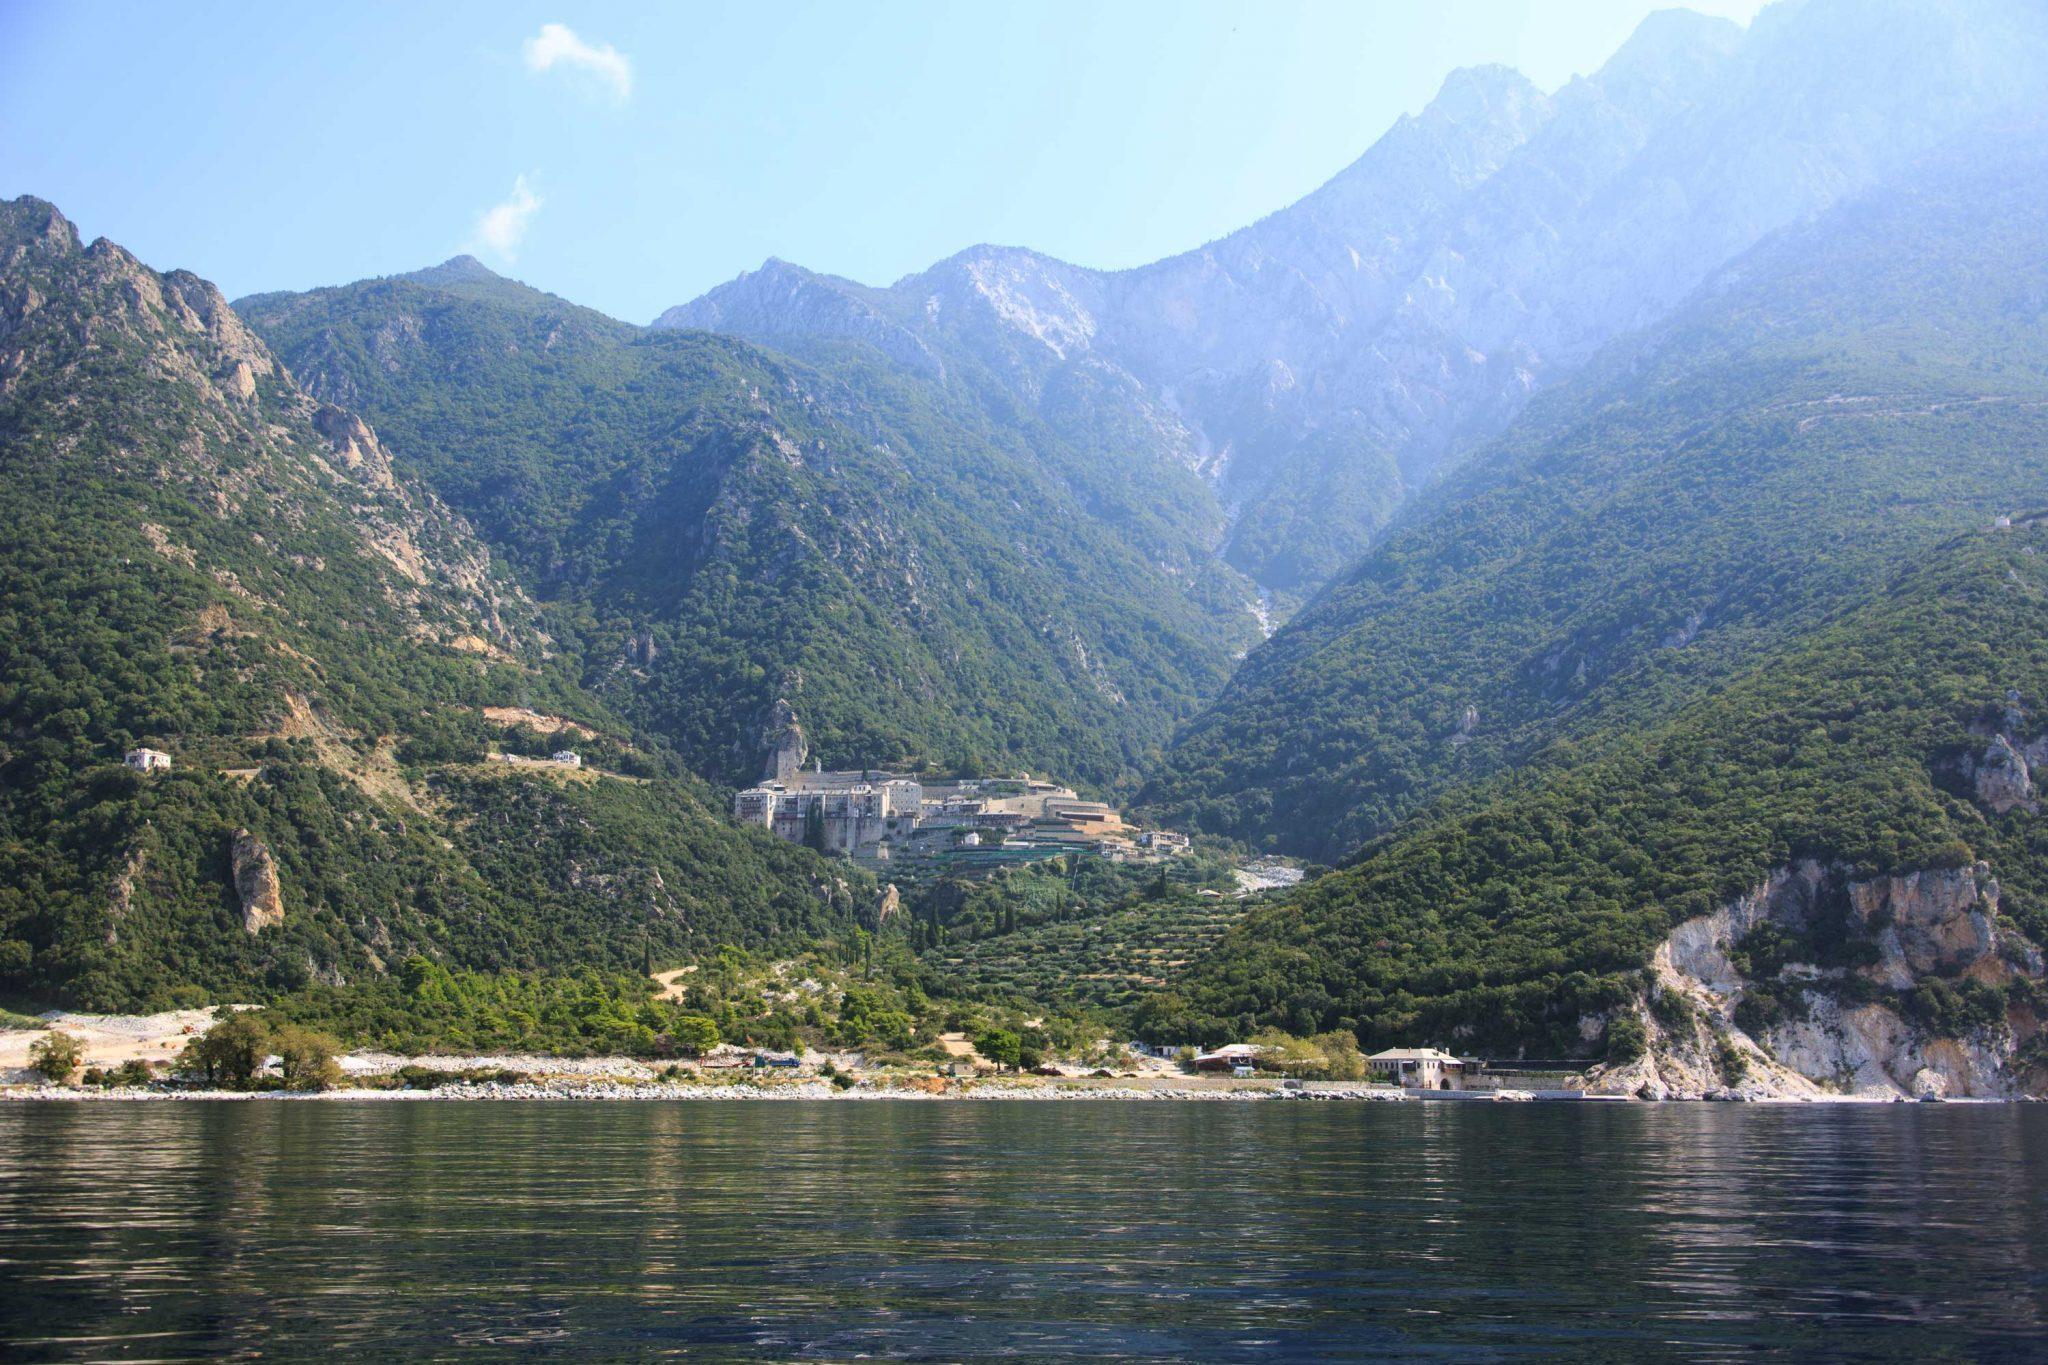 Monastery of Agios Pavlos (St Paul)